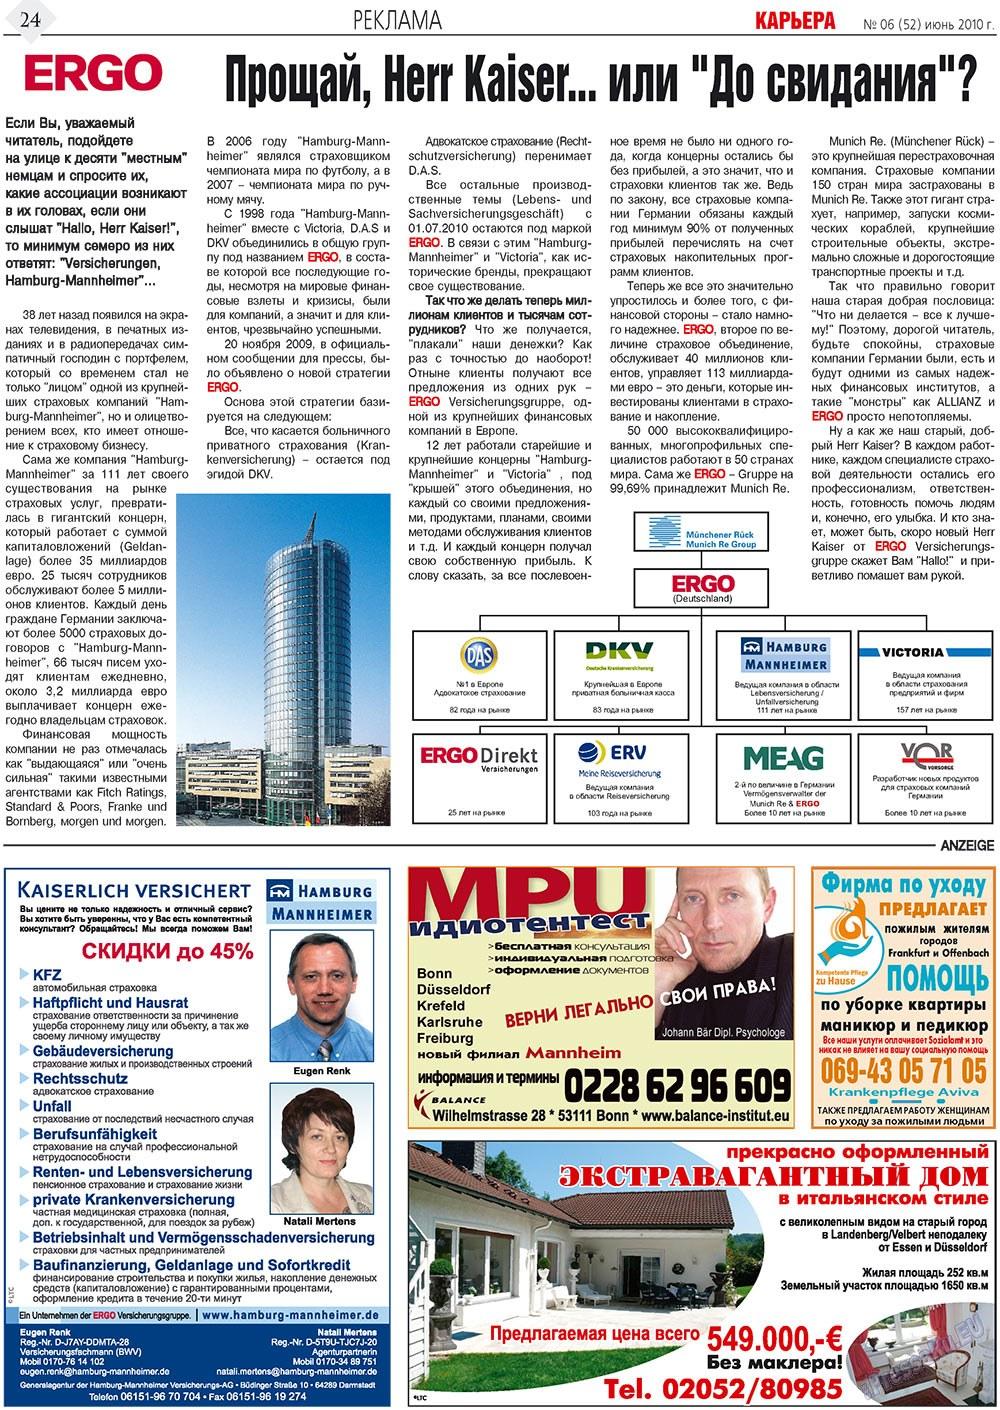 Карьера (газета). 2010 год, номер 6, стр. 24